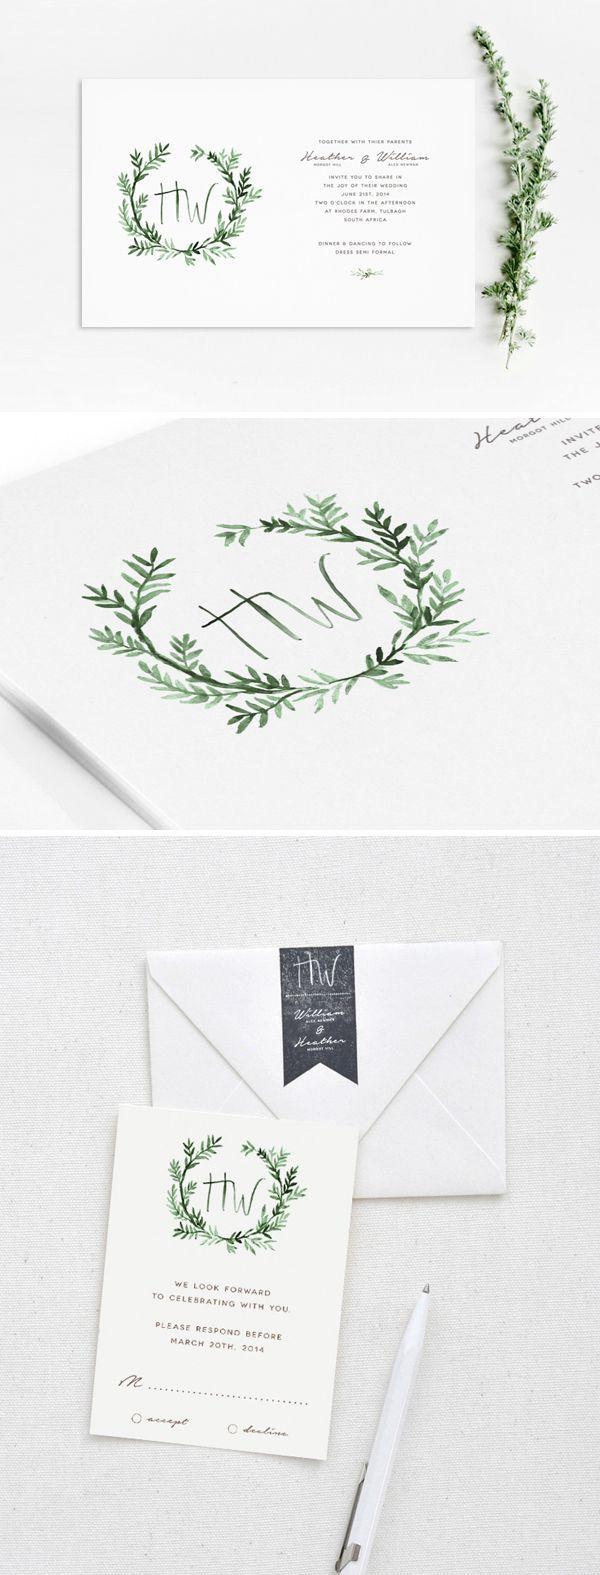 into the woods wedding invite by arabellajune #weddinginvitation